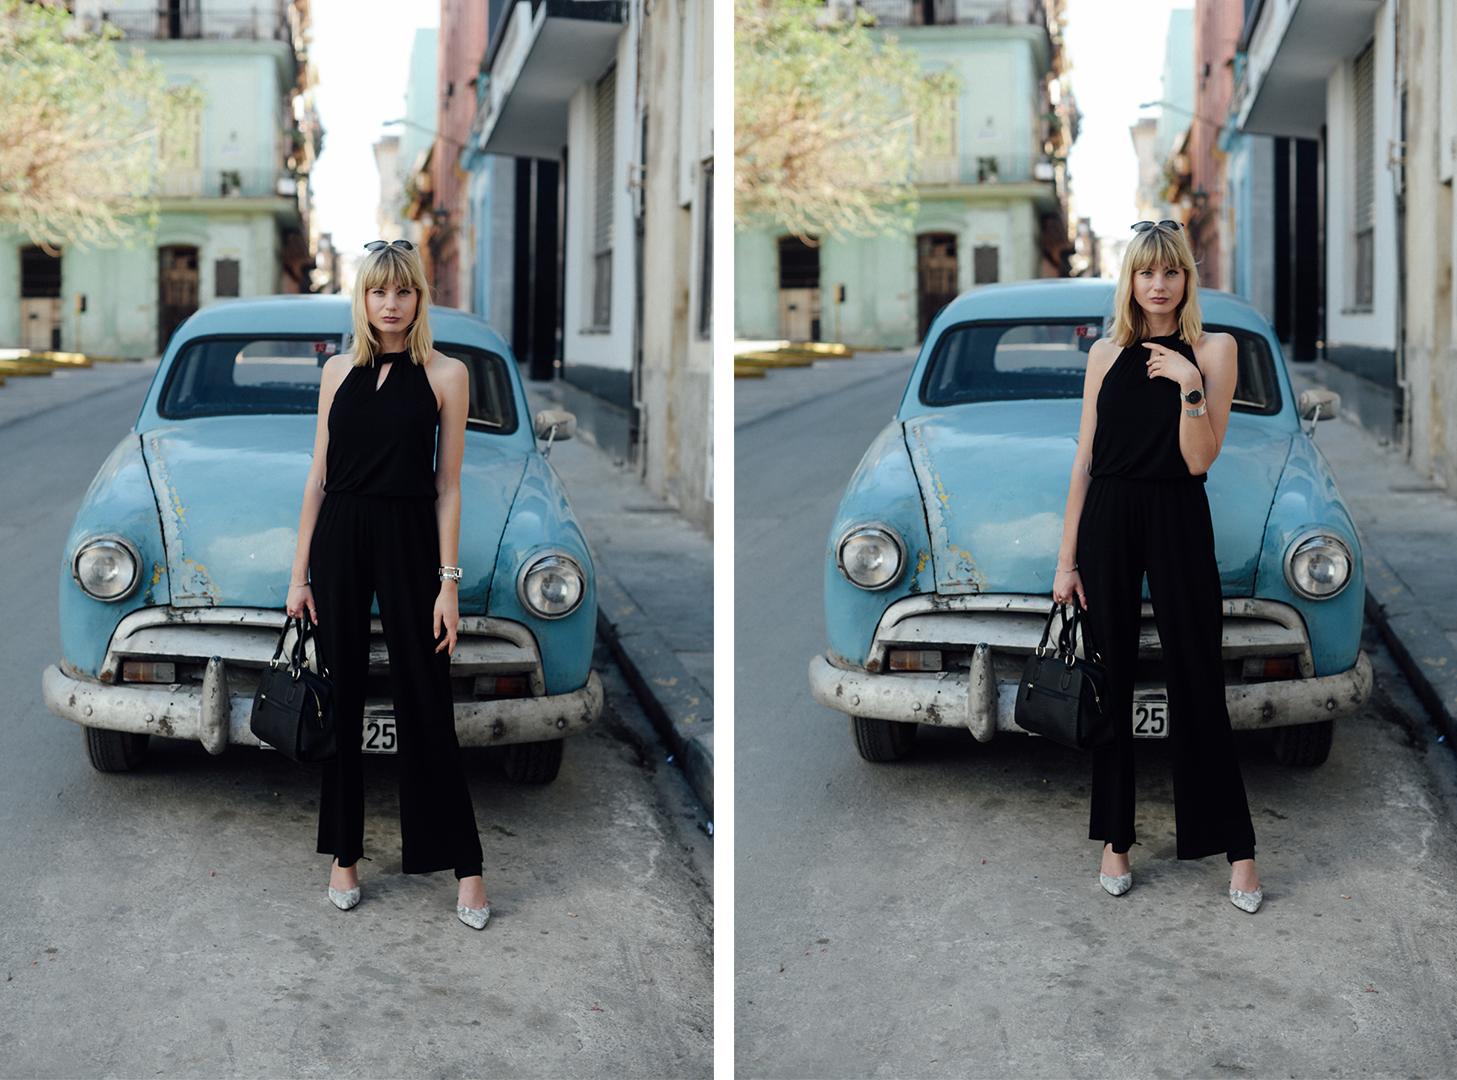 Kiamisu_Modeblog_Fashionblog_Alba Moda_Jumpsuit_Havanna_La Haban Vieja_Kuba Outfit-collage2